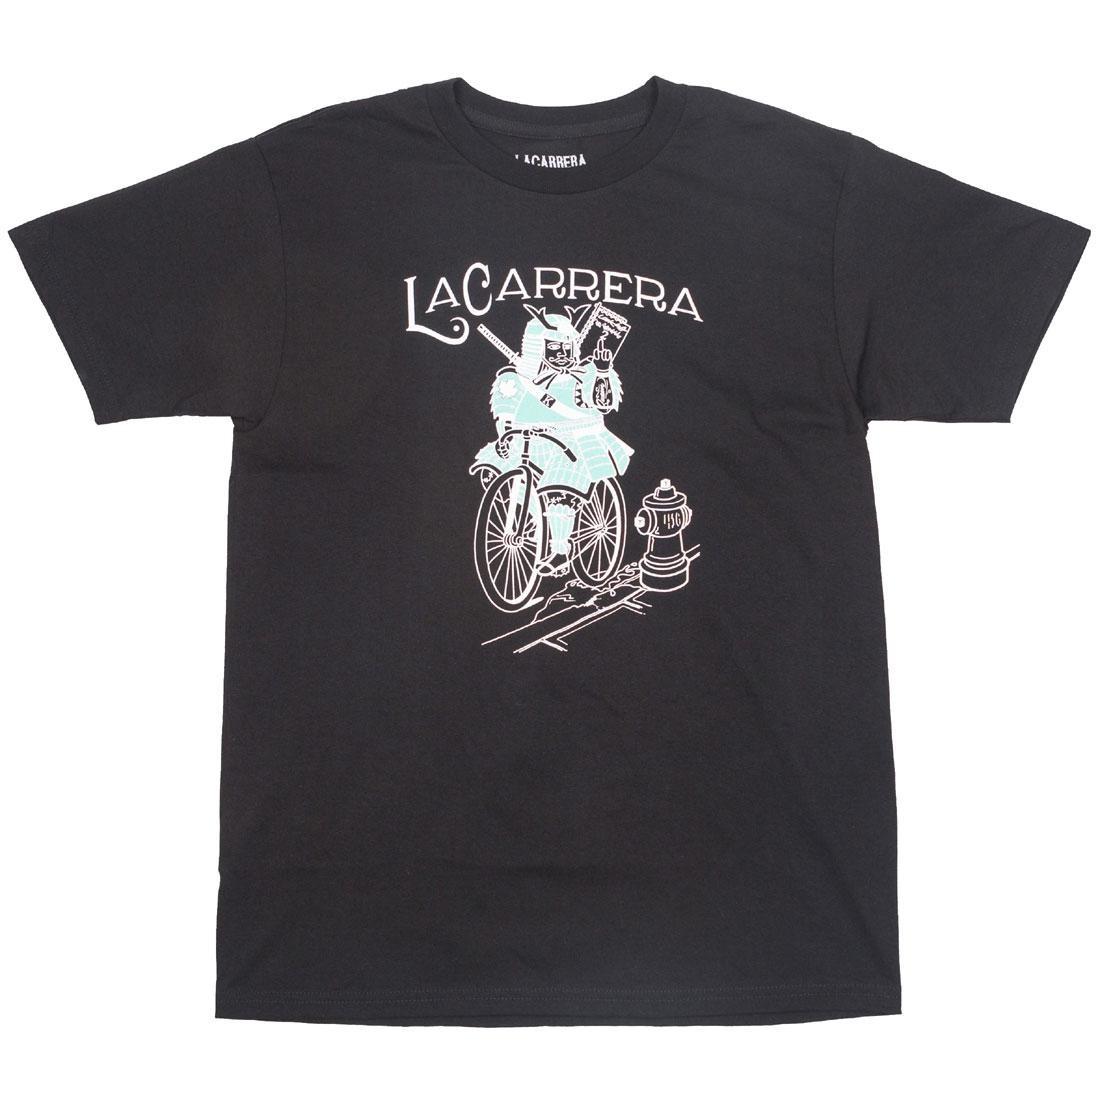 La Carrera Men Samurai King LMNB Tee (black / blue / tiffany)